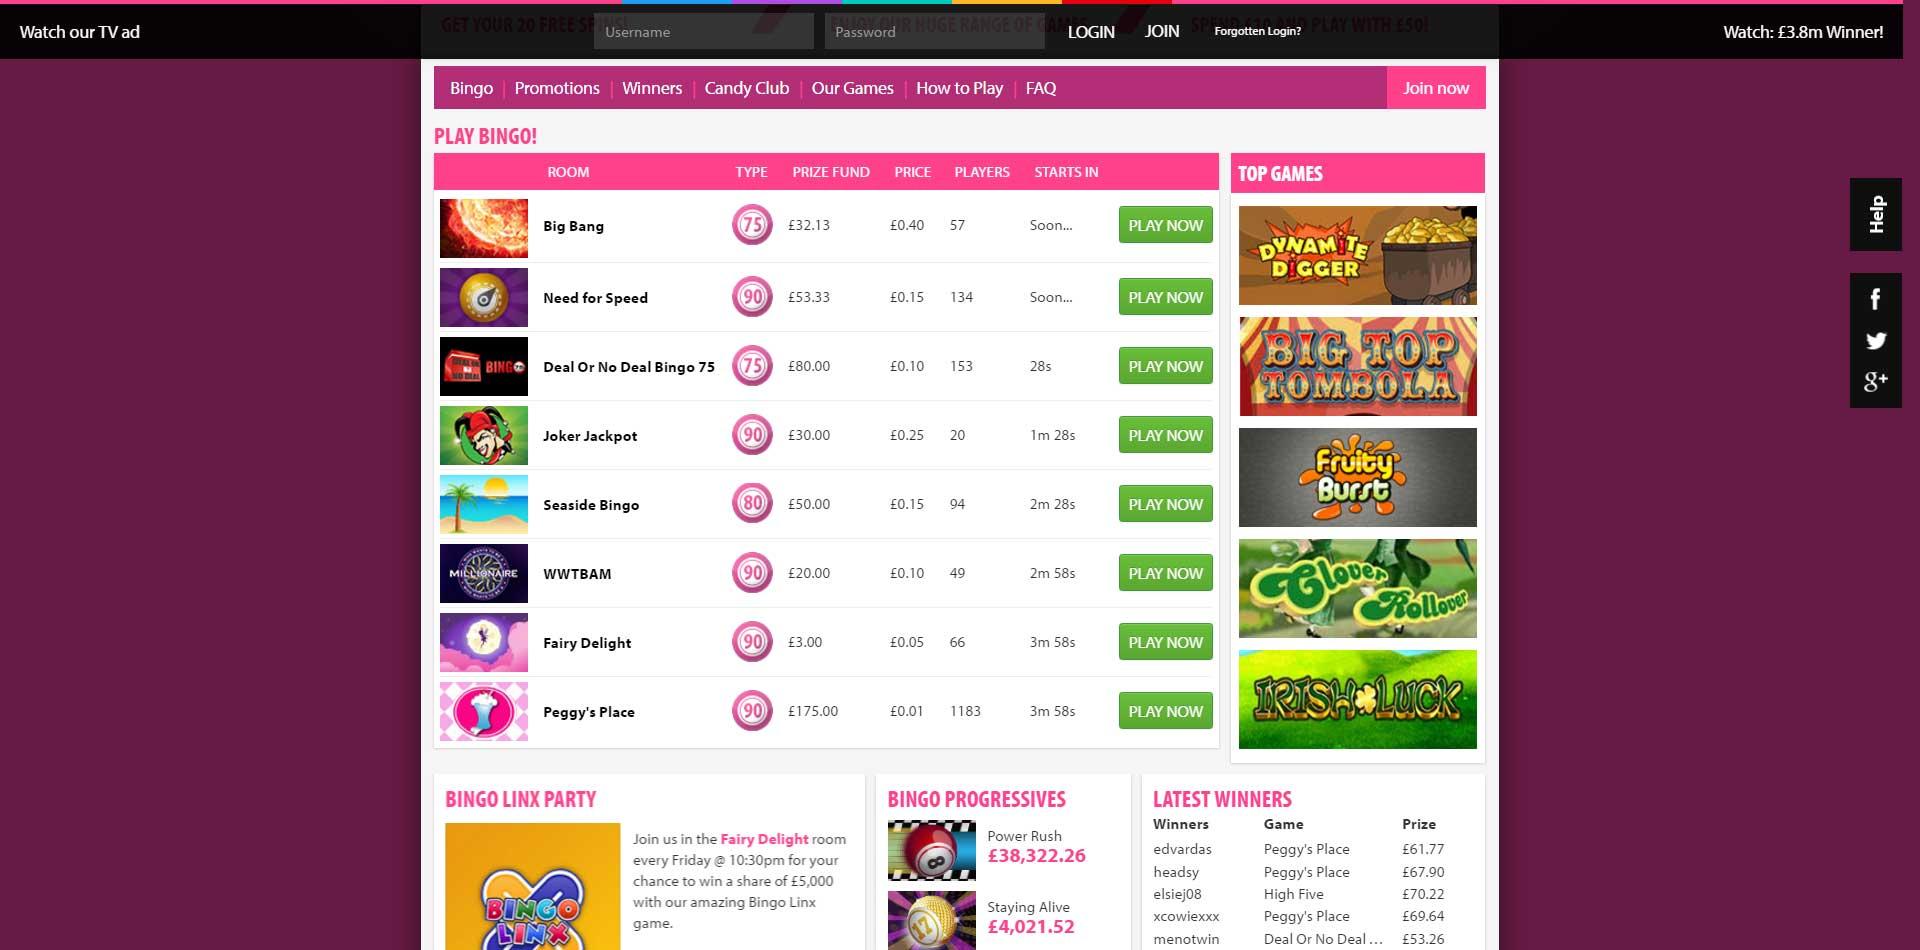 BGO Casino Review - £100 deposit bonus and 20 free spins